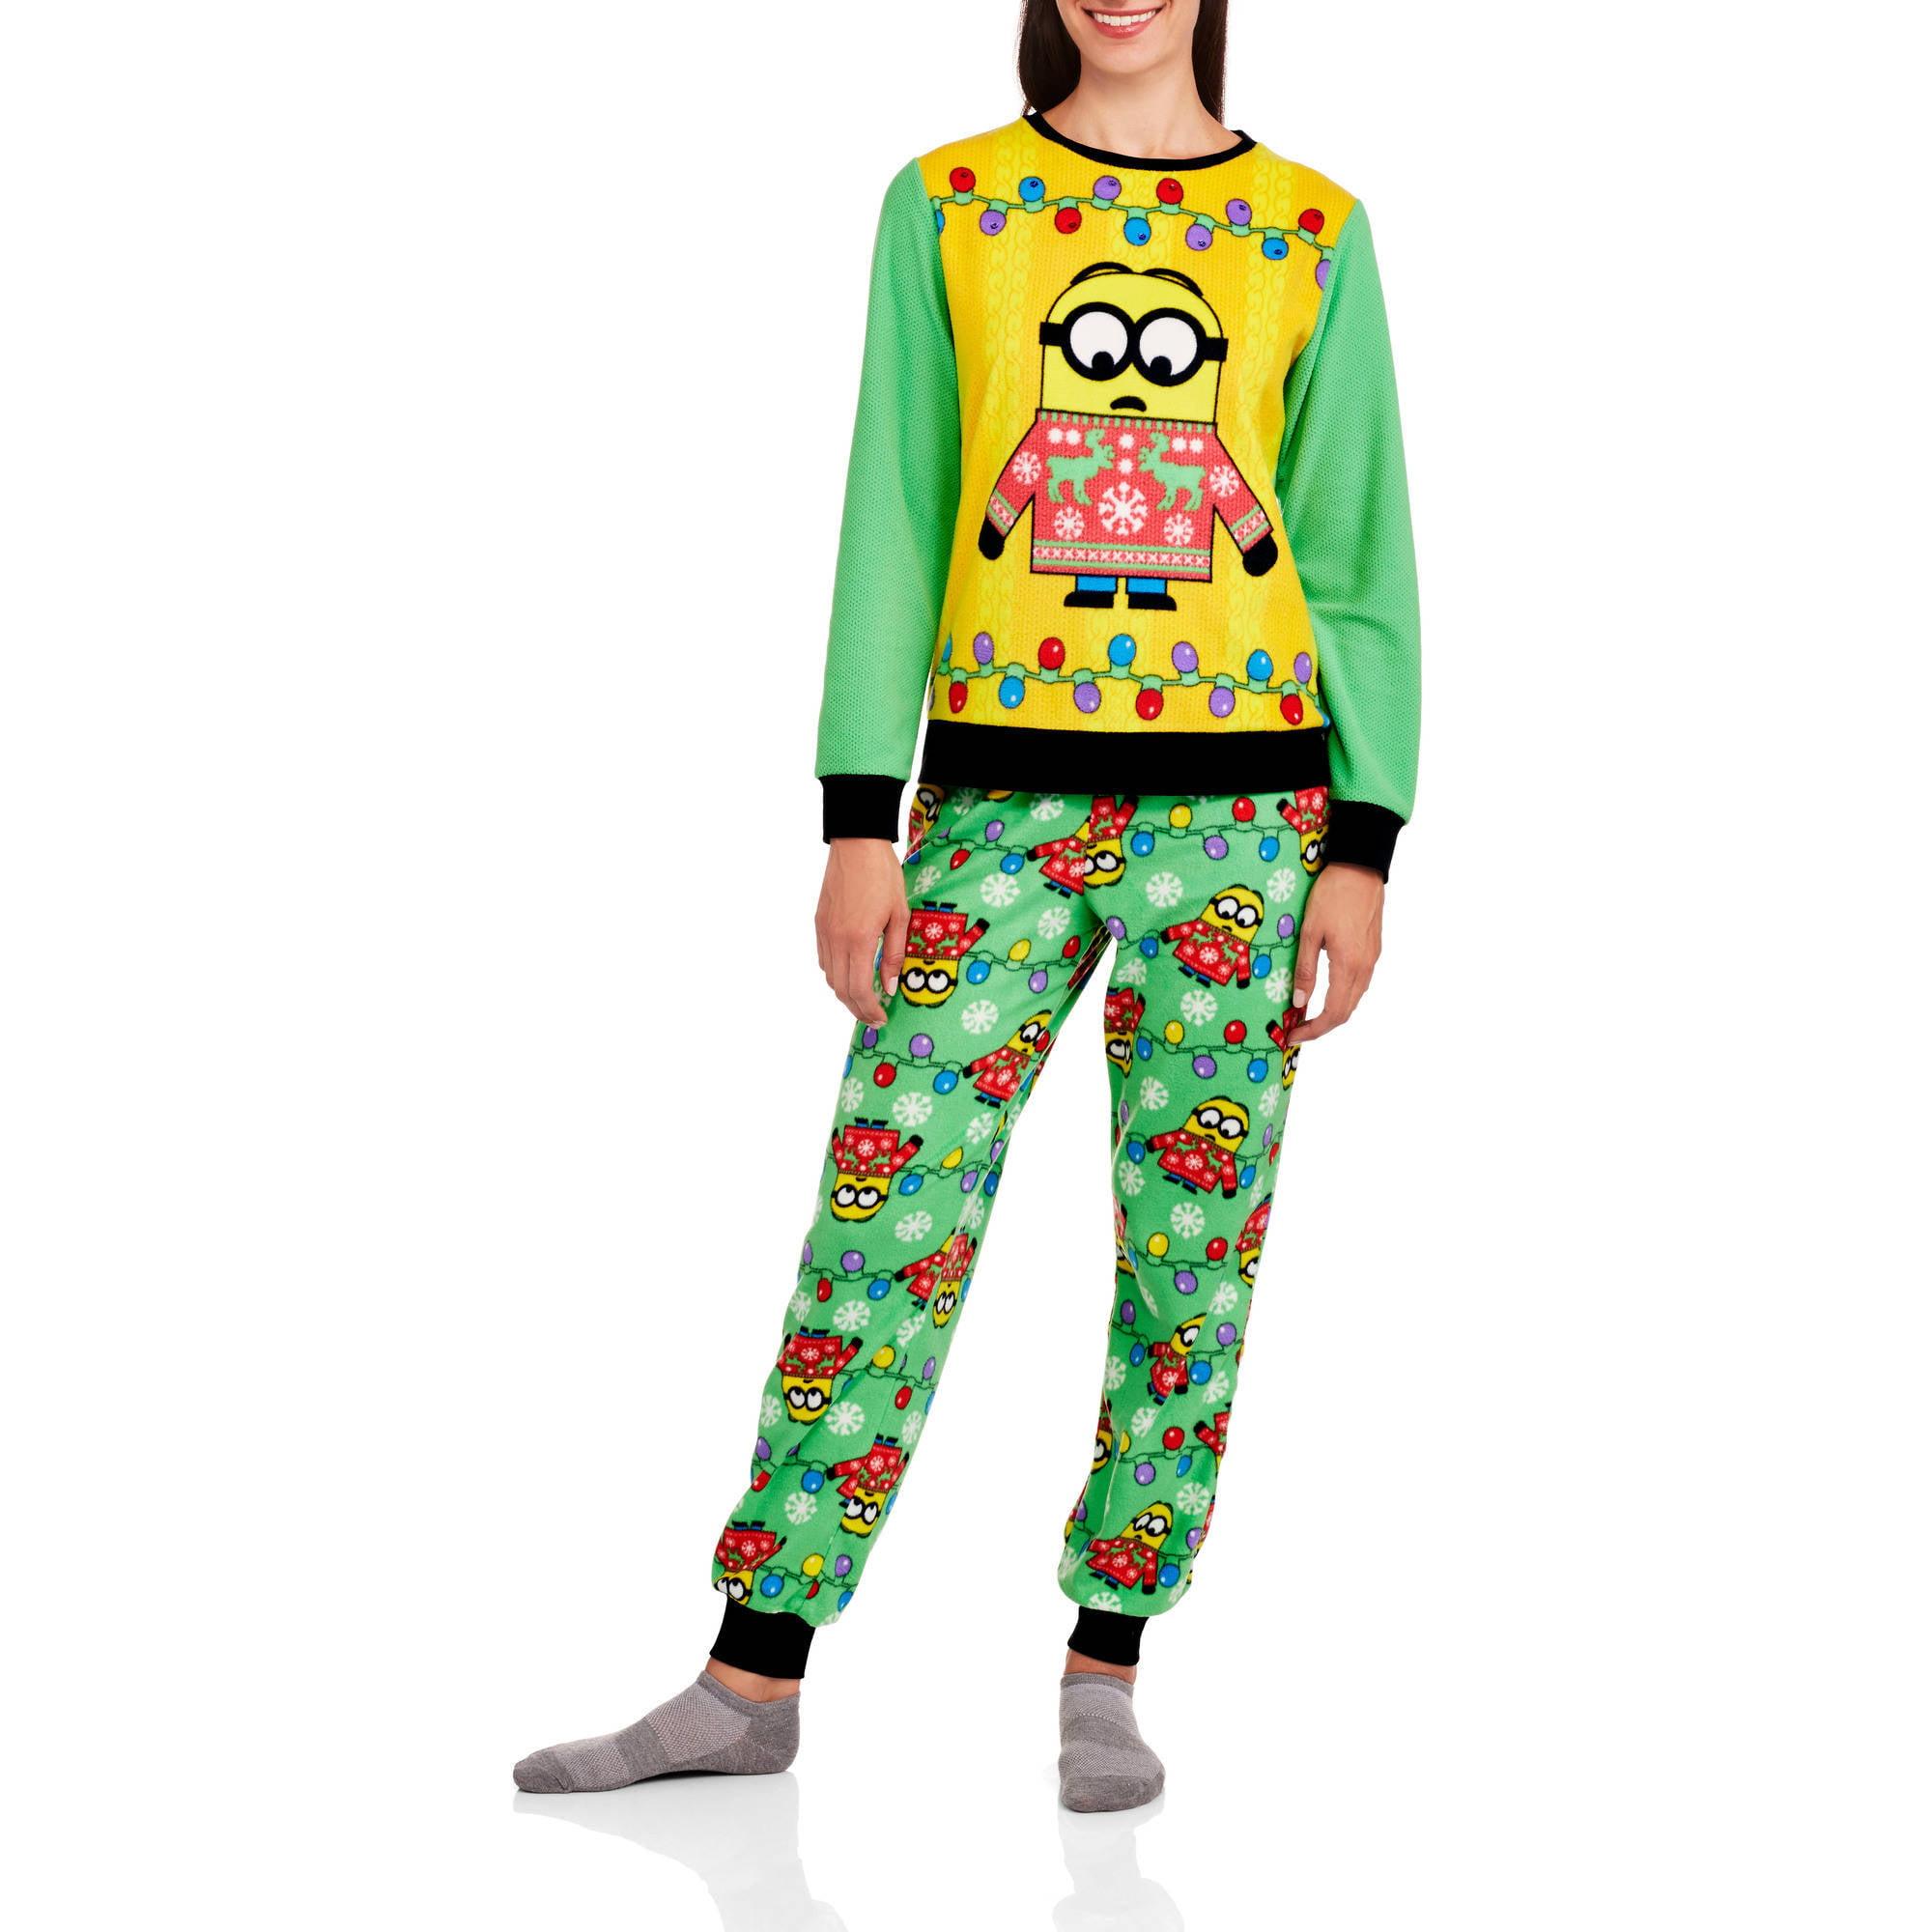 Minion Women's License Pajama Ugly Sweater Fashion  2 Piece Sleepwear Set